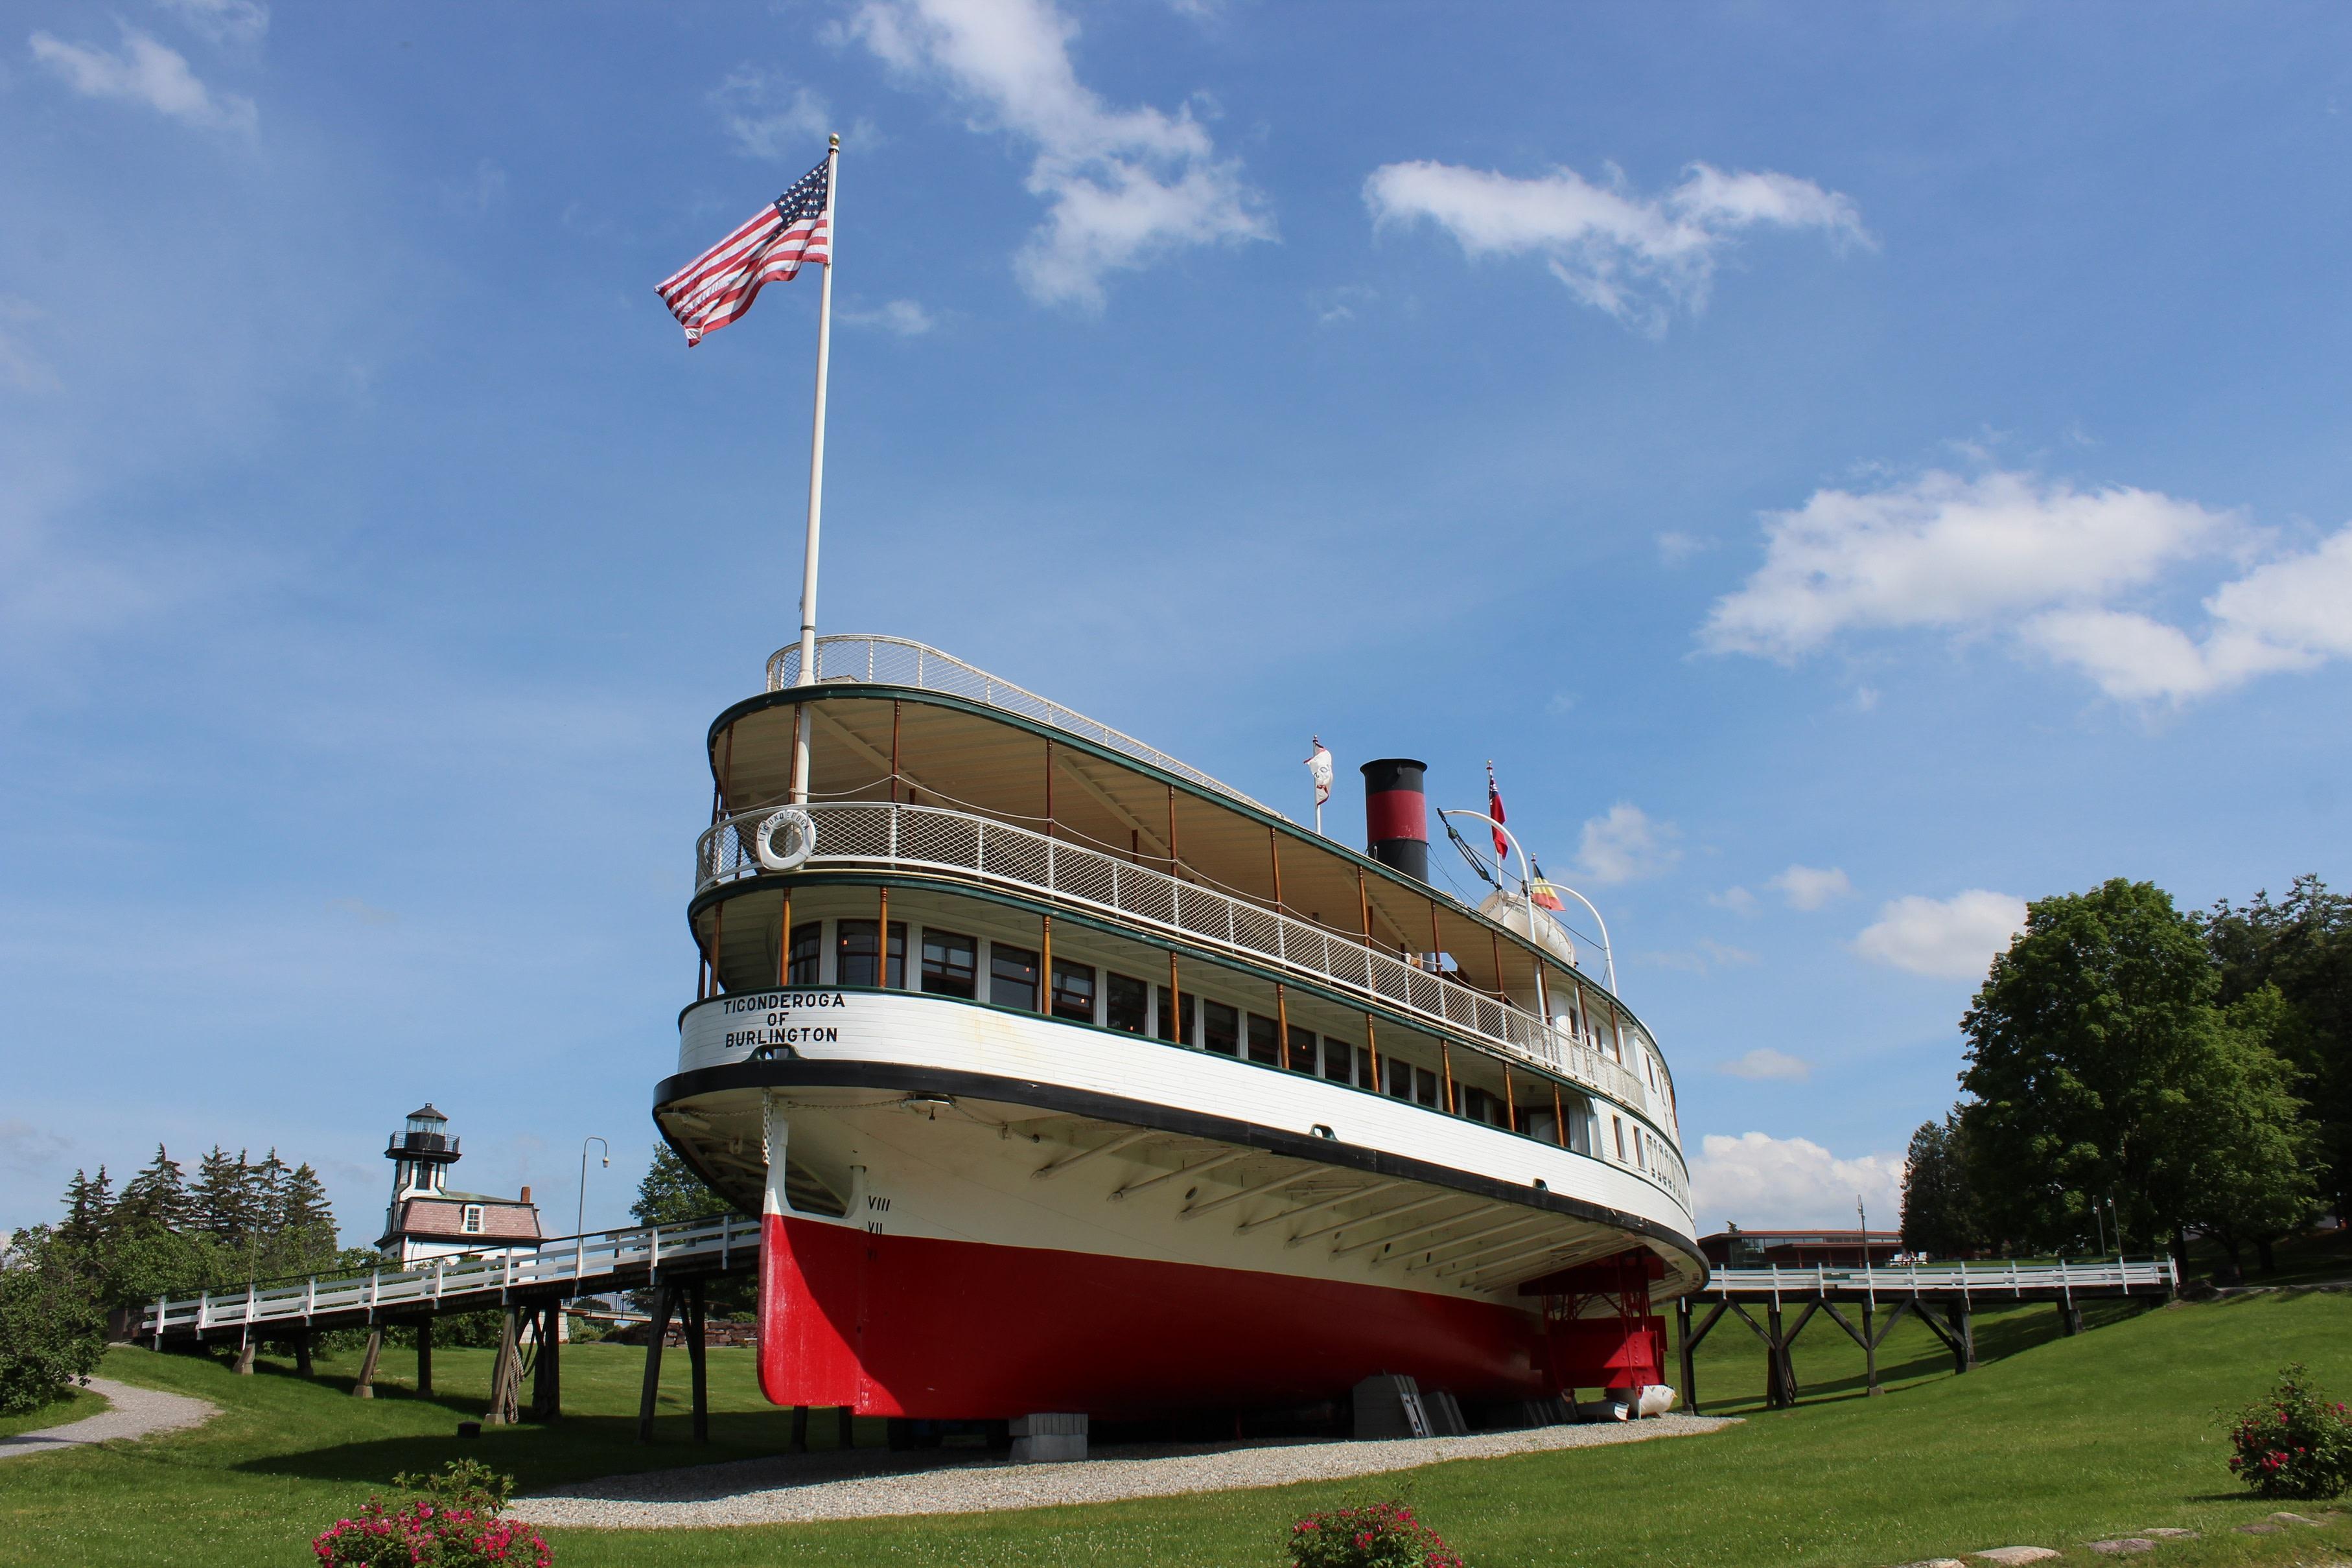 Shelburne Museum Ticonderoga Steamboat Heart of the Village Inn